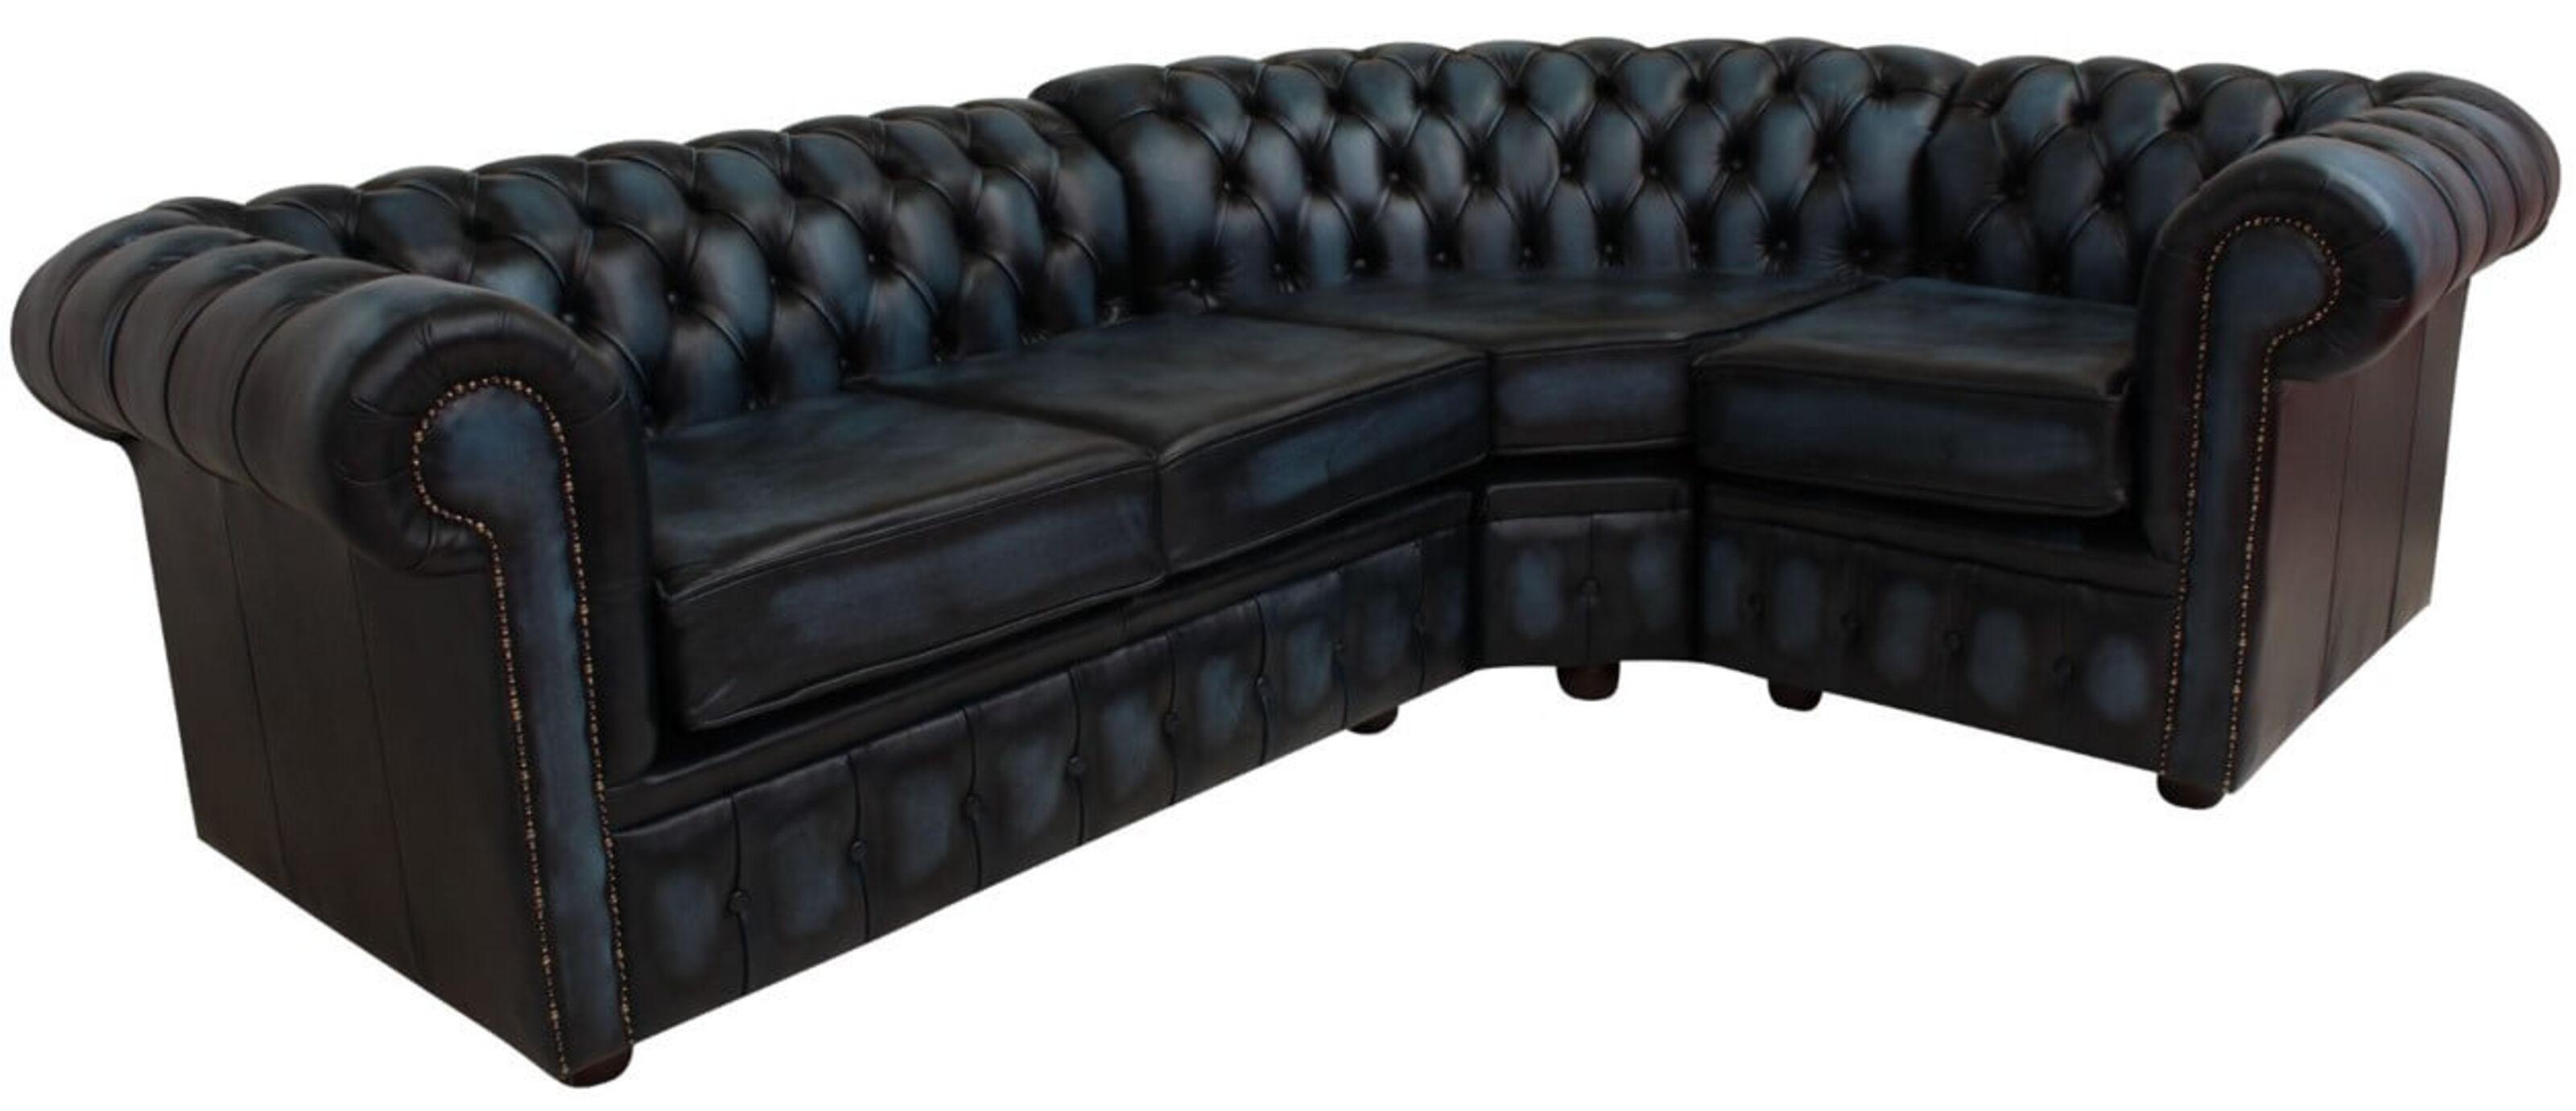 Chesterfield Corner Sofa 2 Seater